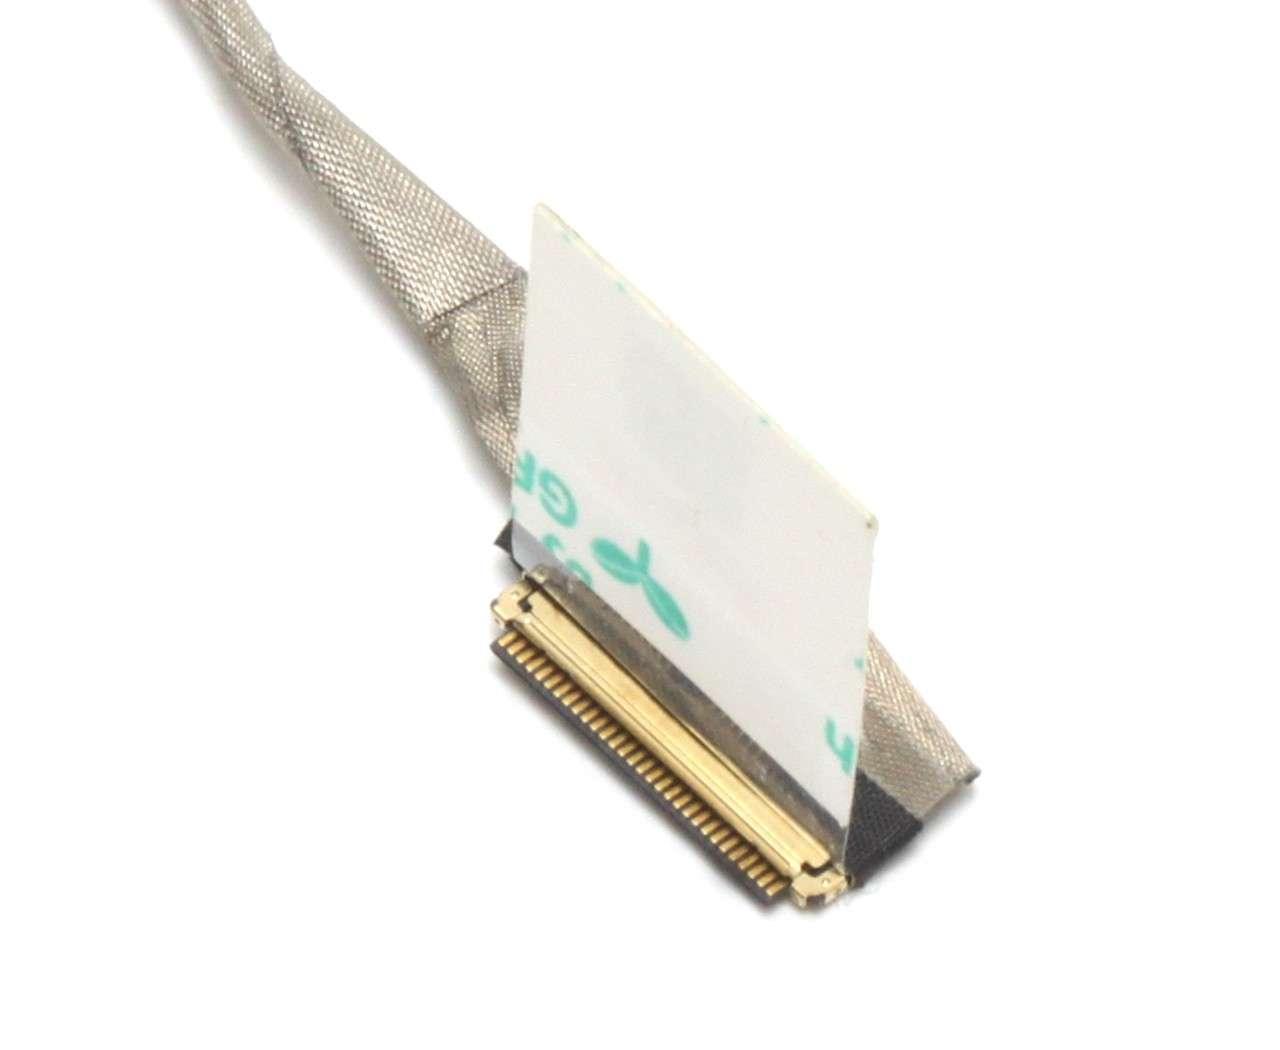 Cablu video LVDS Acer Aspire E5 574 30 pini FULL HD 1920x1080 fara touchscreen imagine powerlaptop.ro 2021